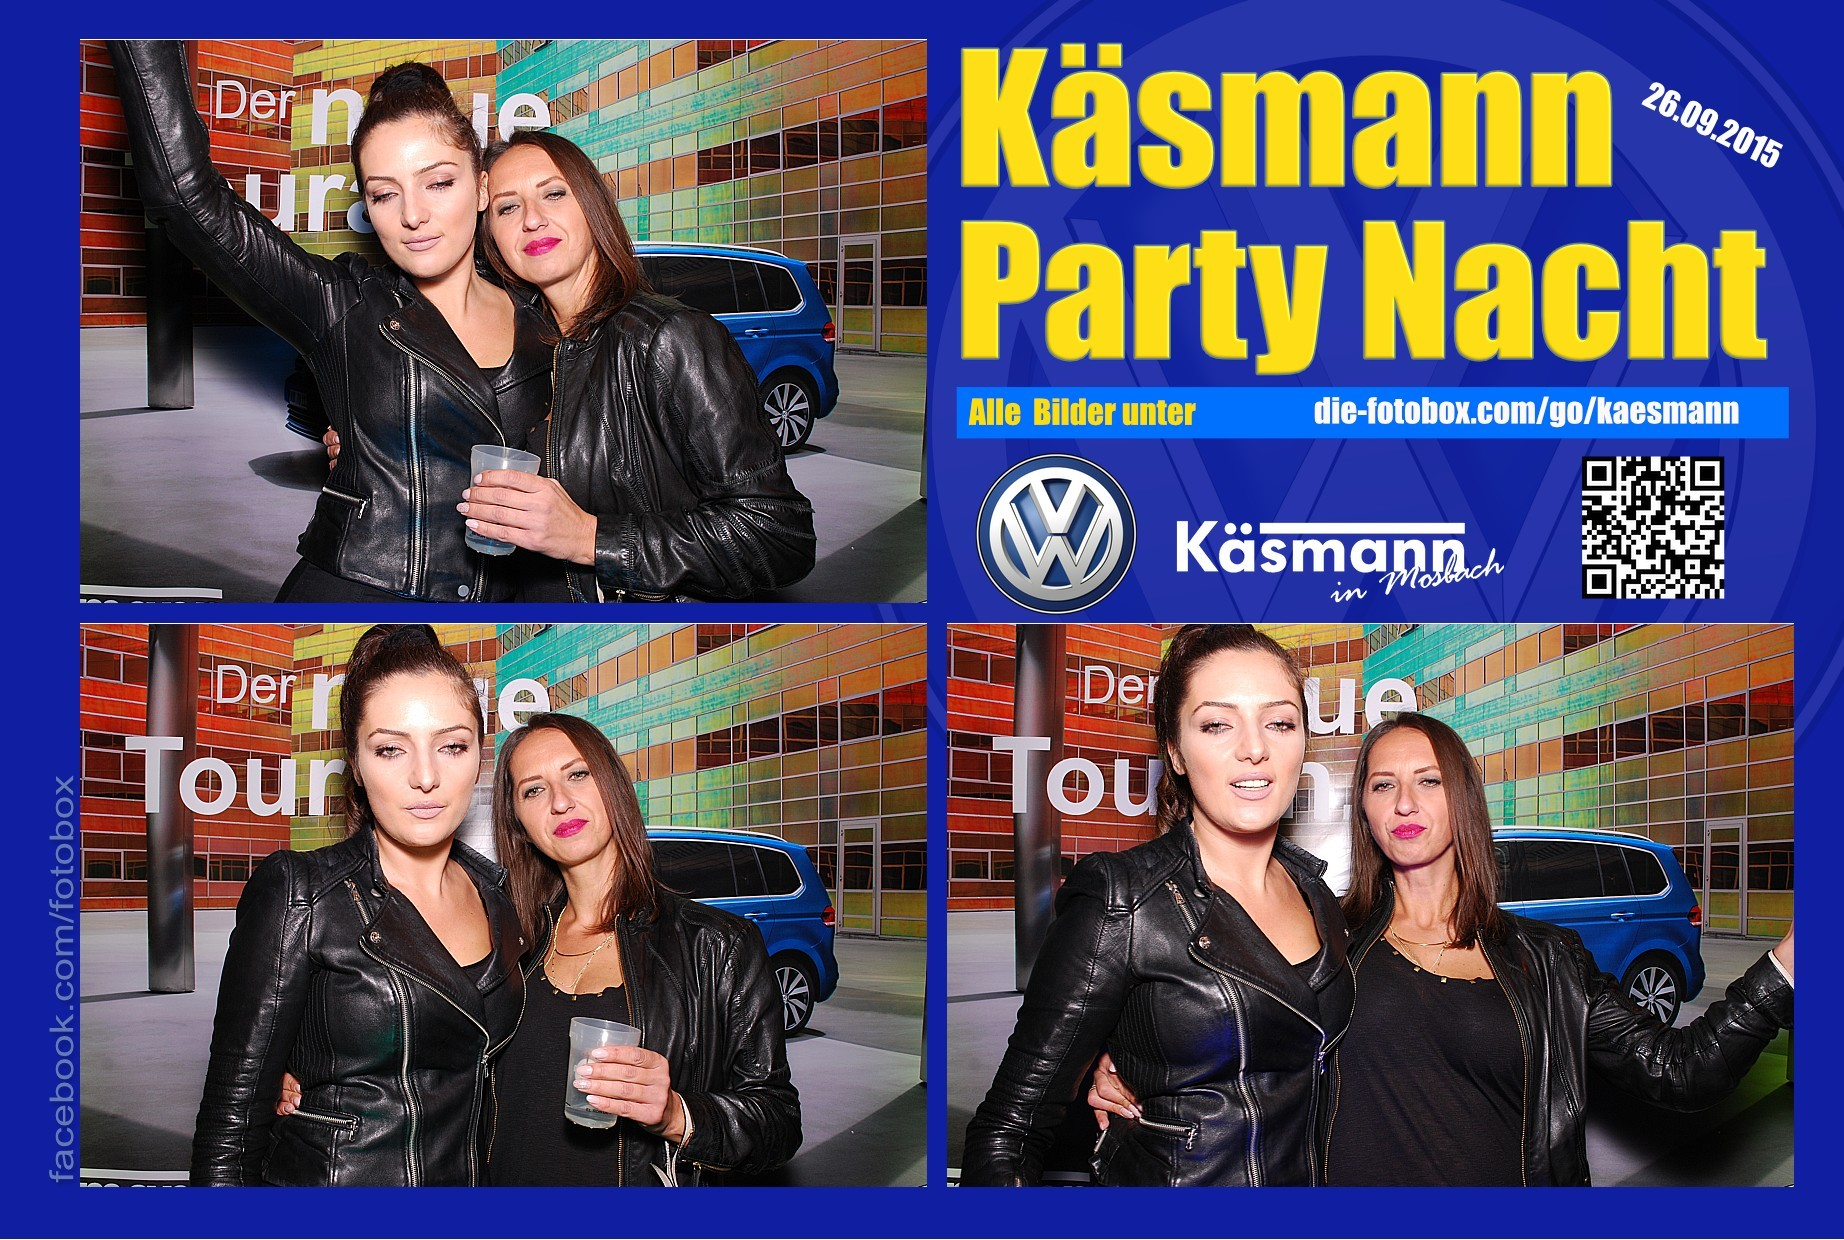 Käsmannparty 2015 - www.die-fotobox.com 01072